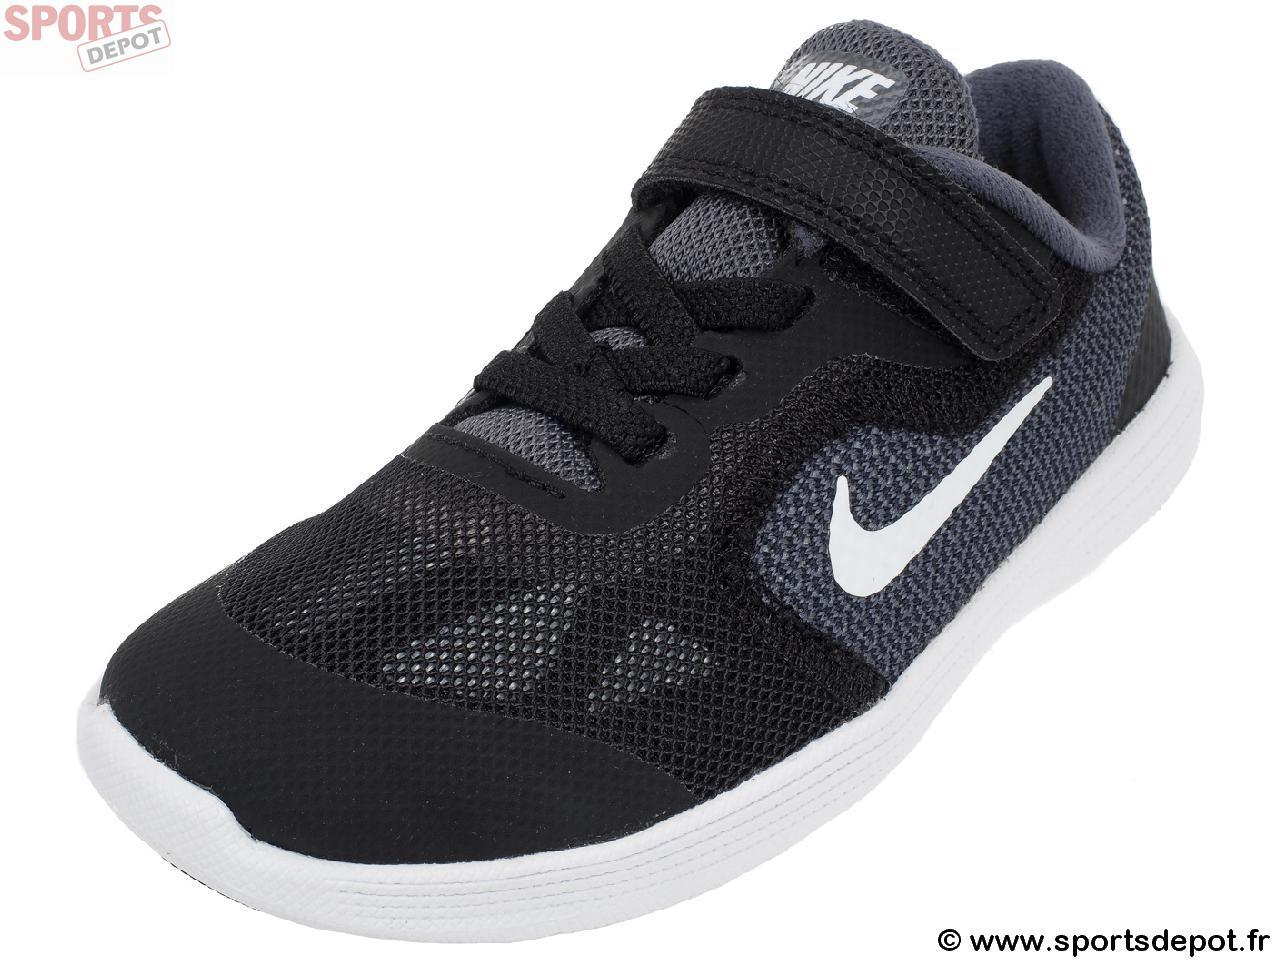 Nike Baby Scratch Chaussures Multisport 3 Revolution Acheter qwp4ETa